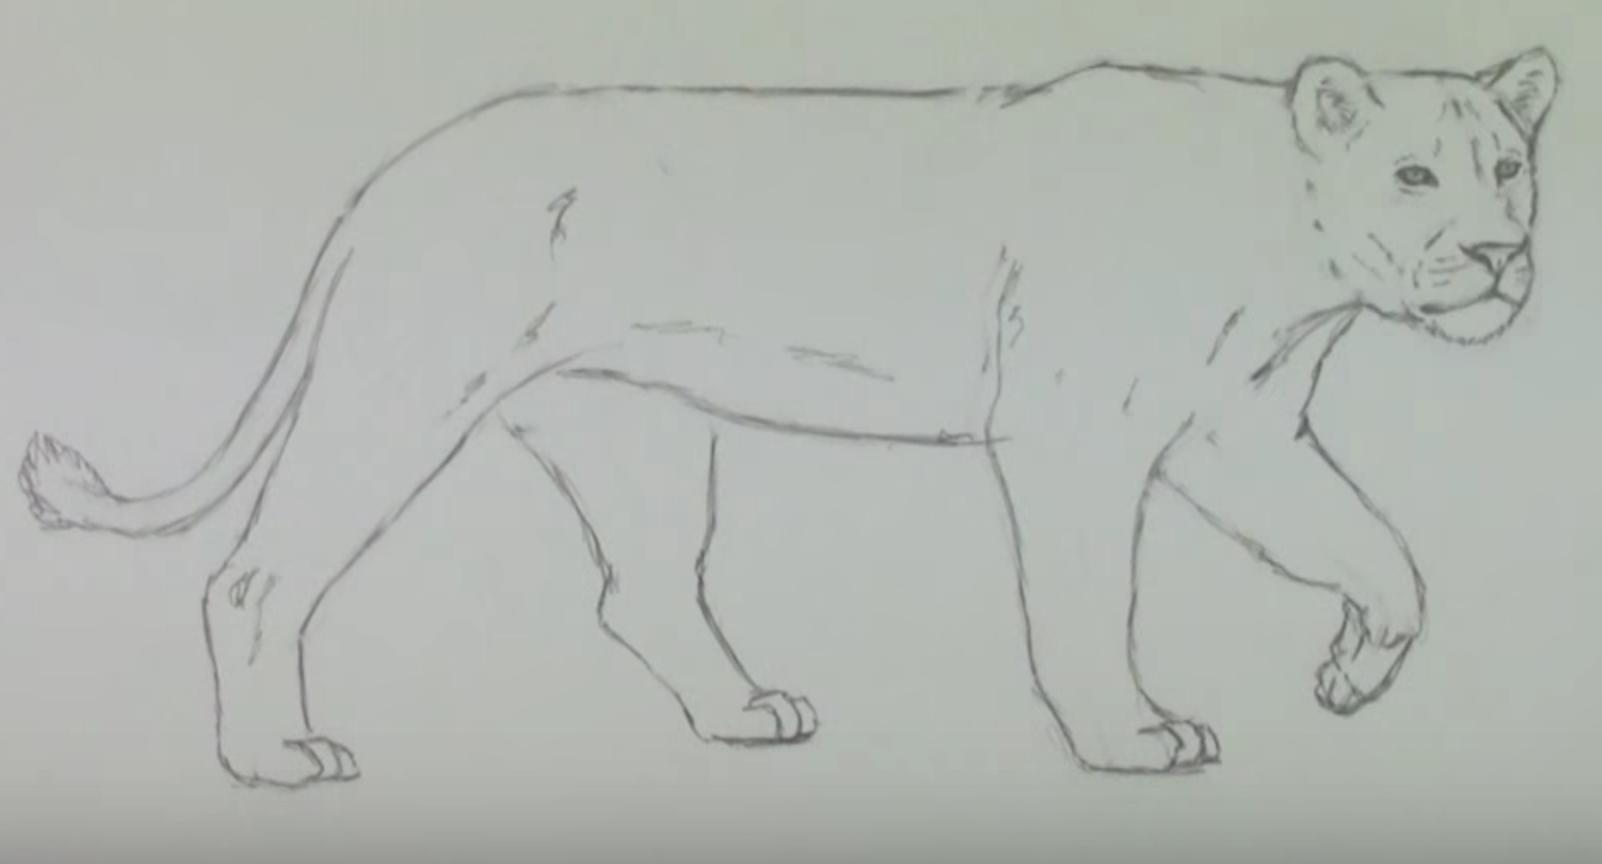 фото рисунки львов карандашом, идеи фото 4